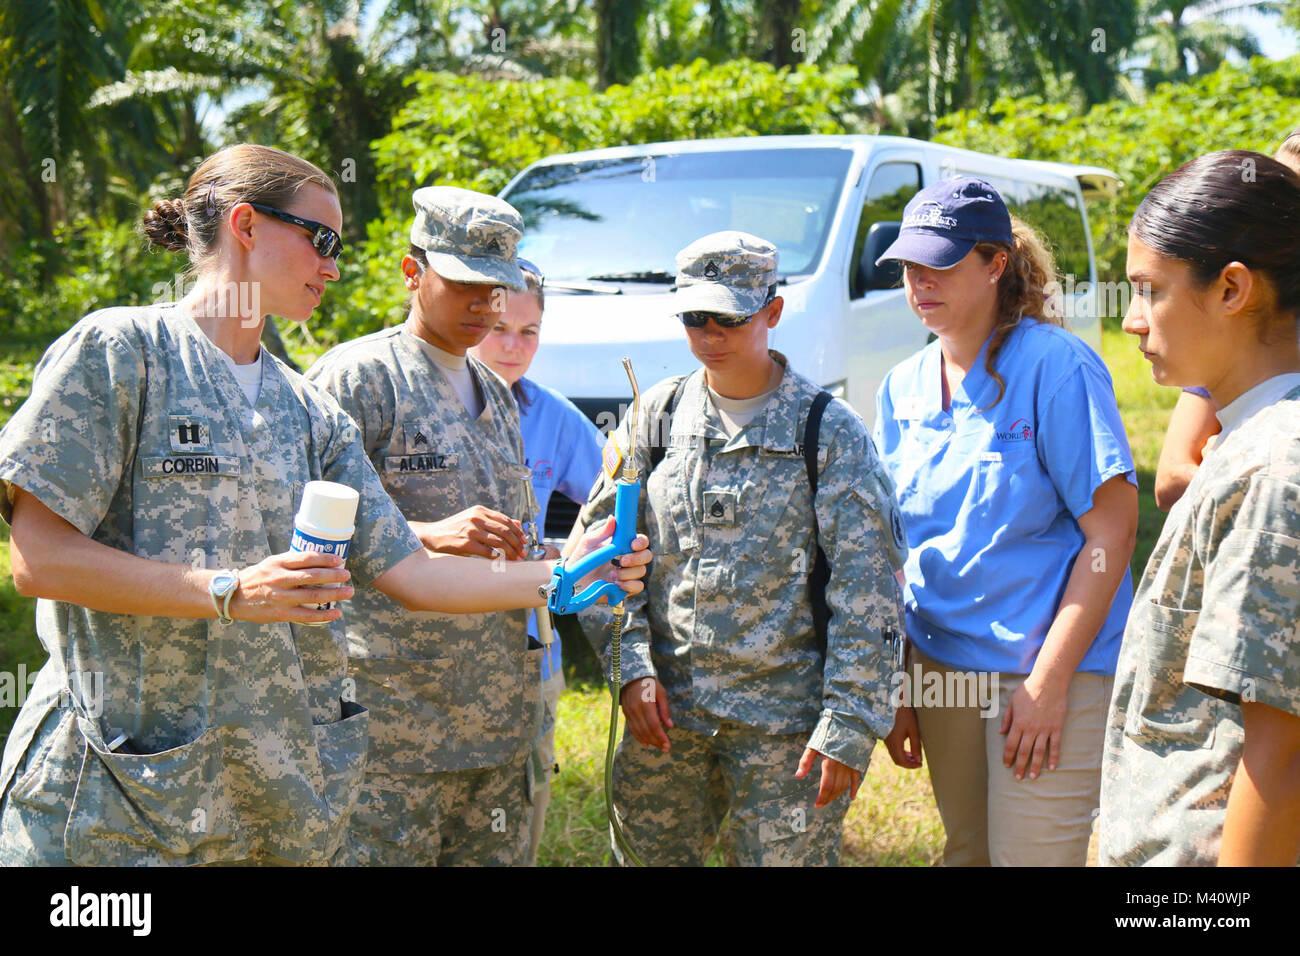 150830-A-ZA034-008 COLON, Honduras (Aug. 30, 2015) Army veterinarians, veterinarian technicians and a volunteer - Stock Image